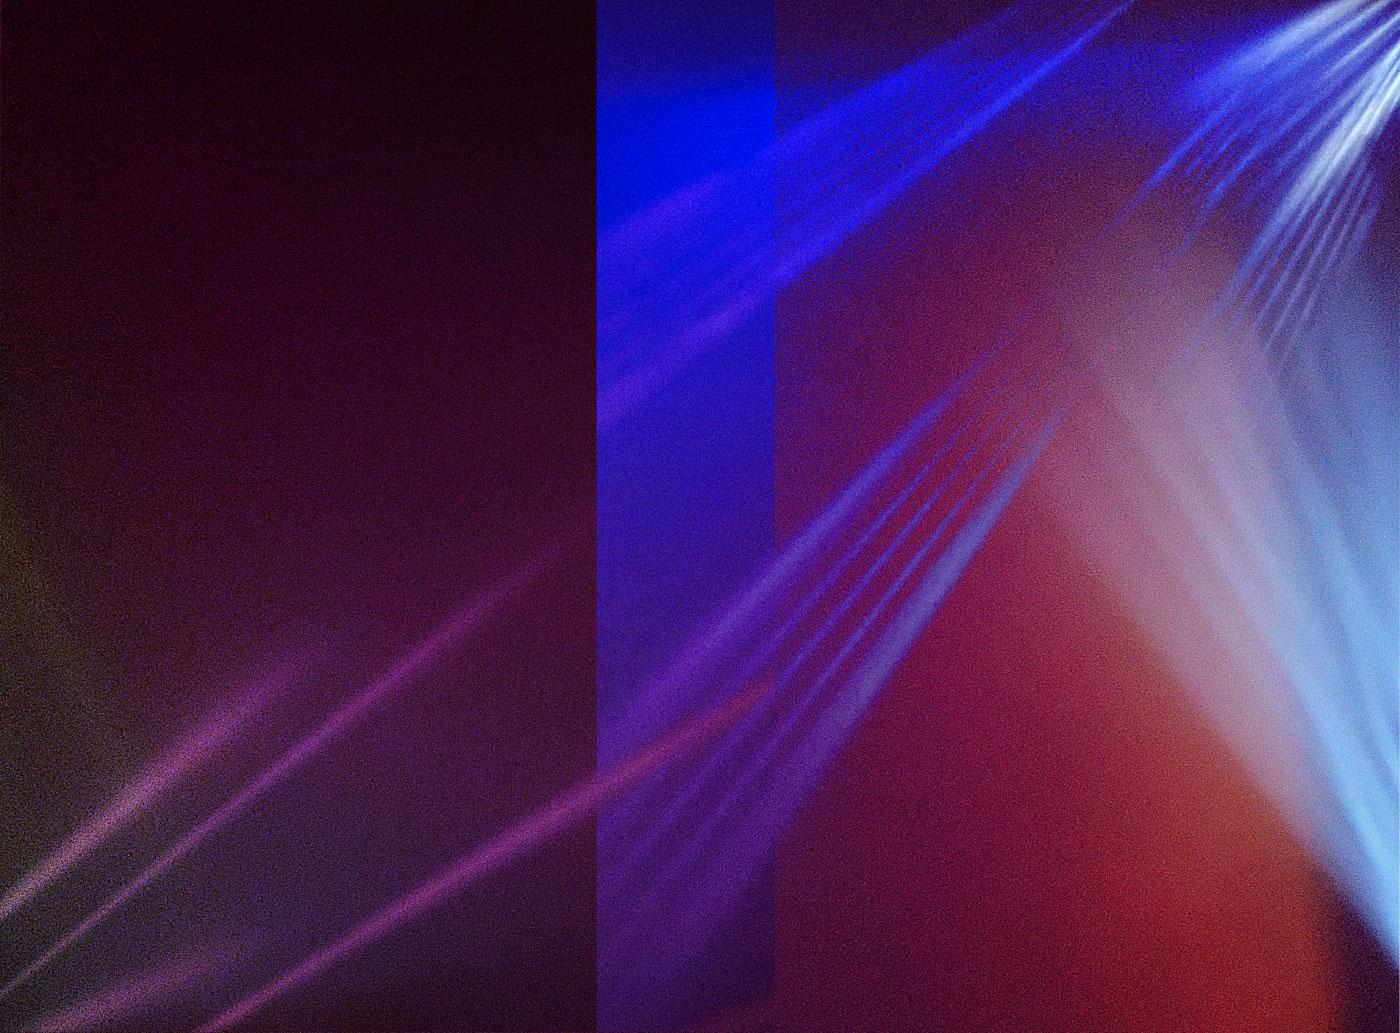 First Light • 122 x 90 cm (48.03 x 35.43 in)